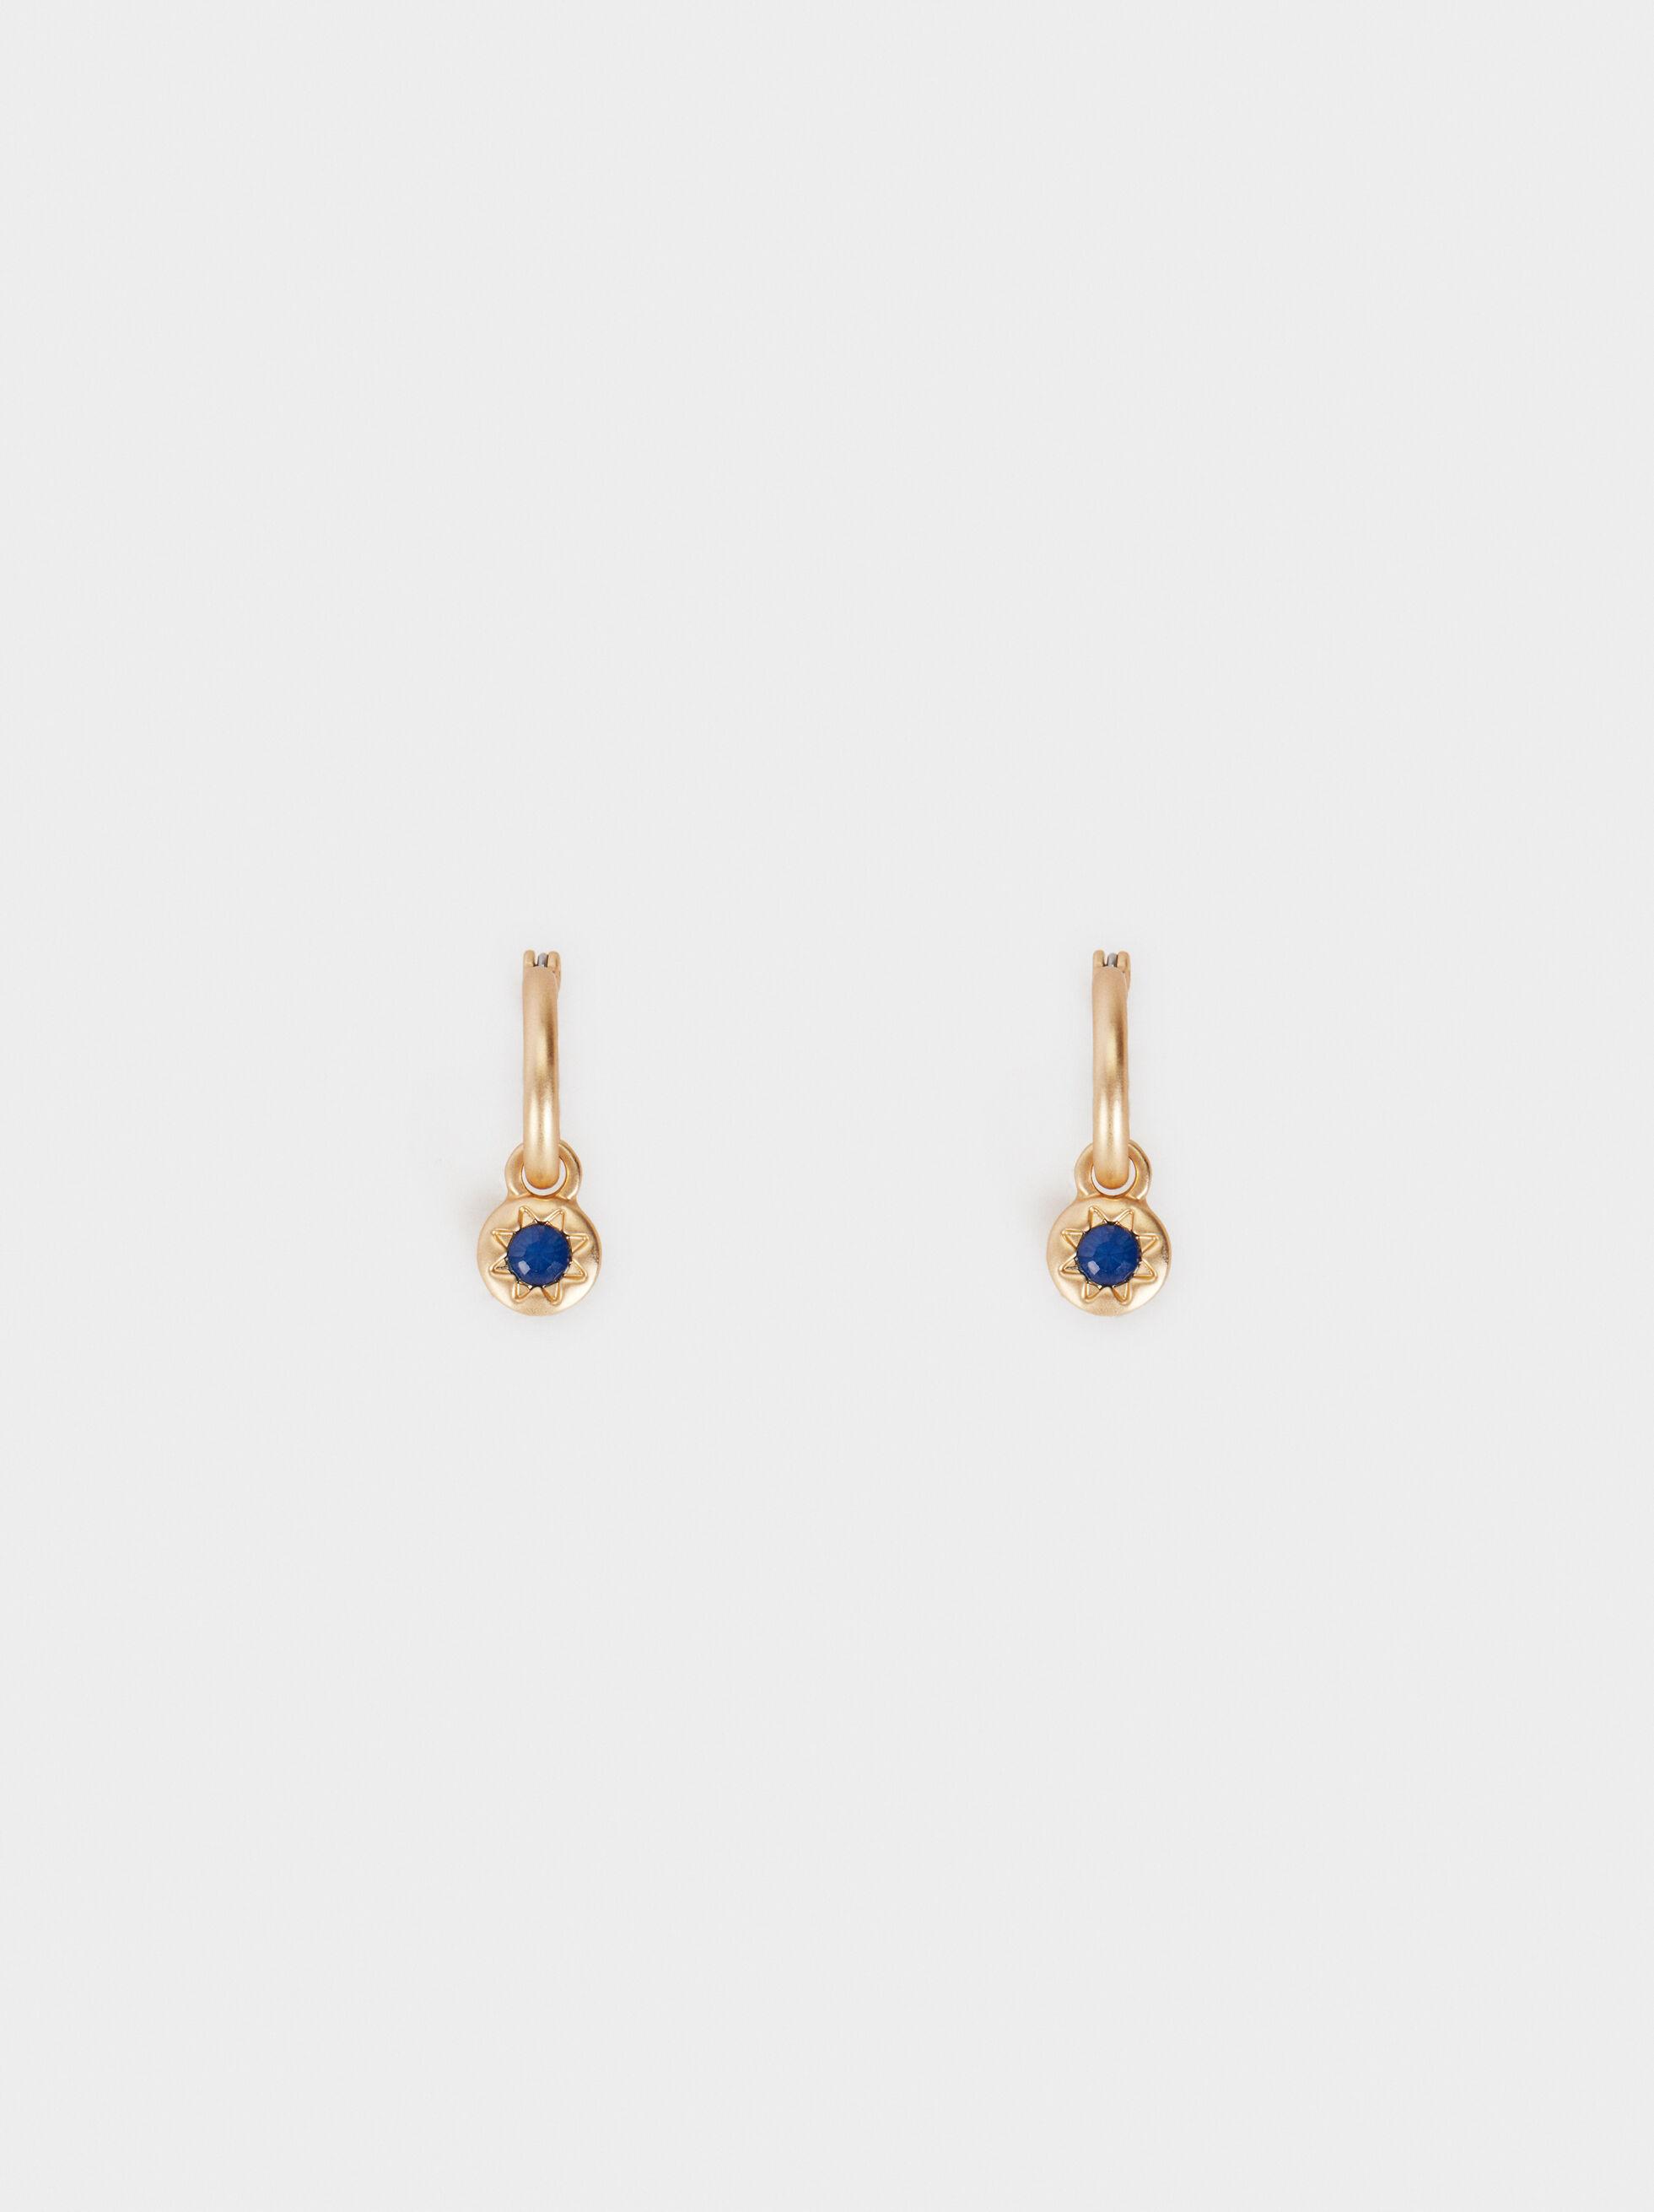 Zorba Small Shiny Hoop Earrings, Multicolor, hi-res